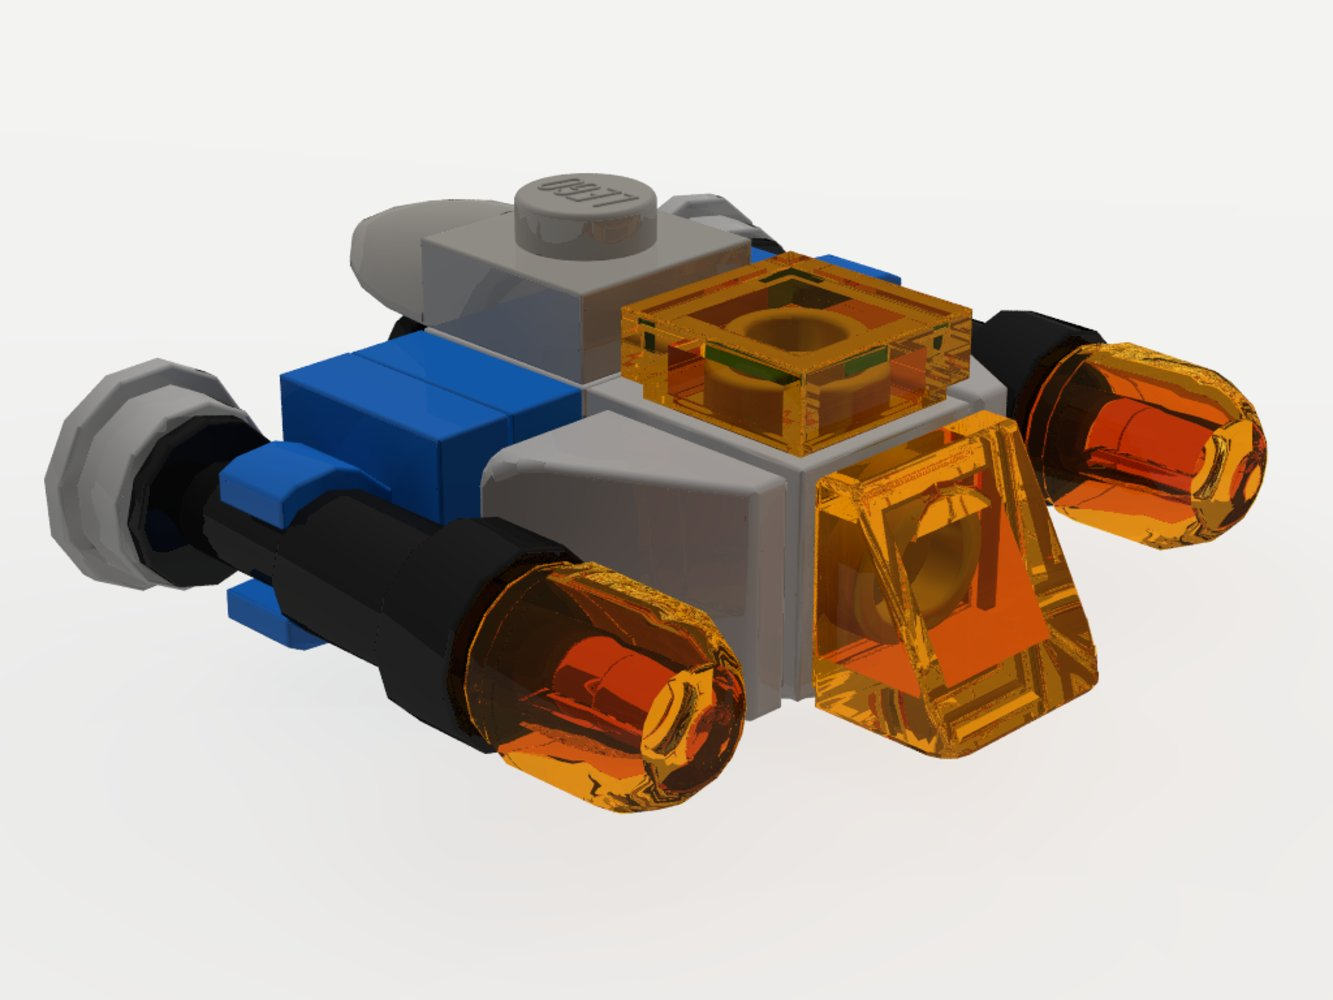 Micro Battle Blaster